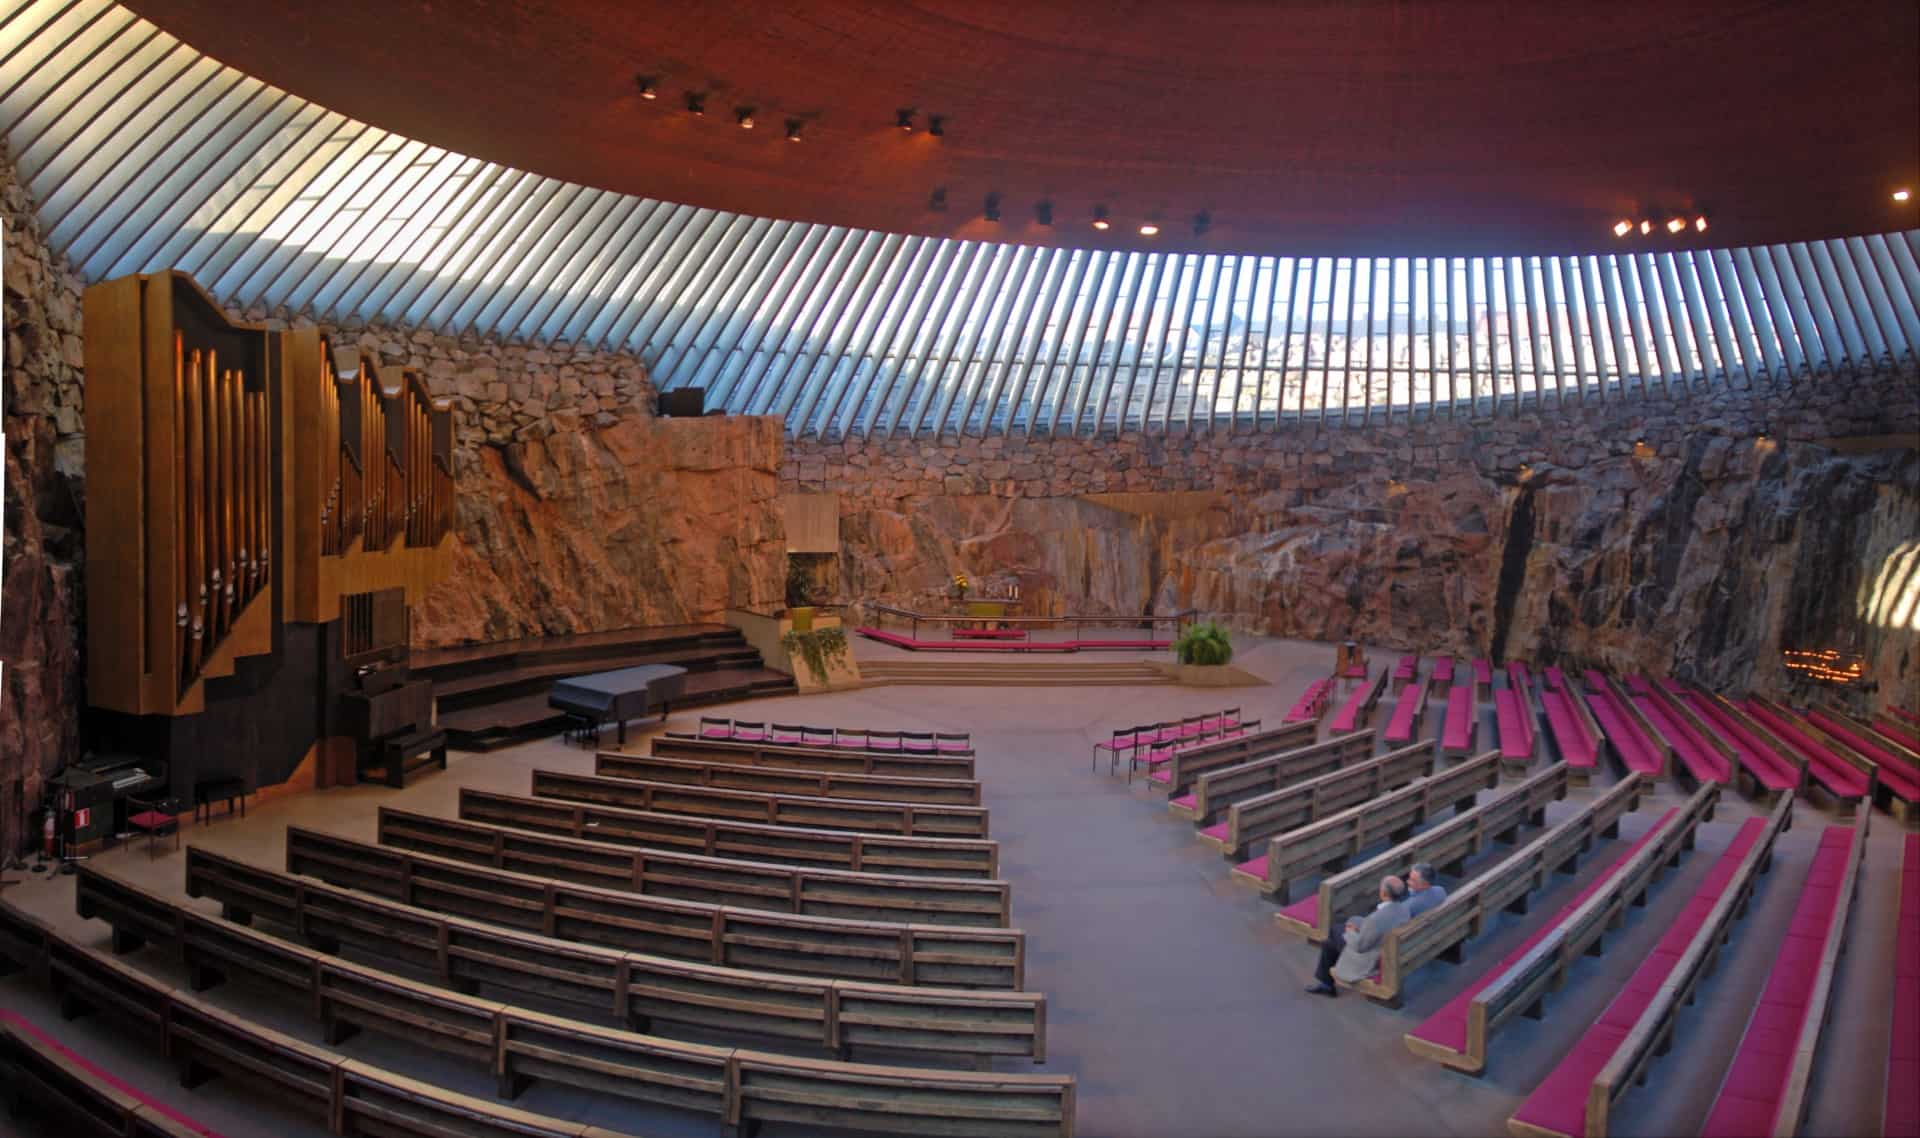 Temppeliaukio Kirkko (Church of The Rock) interior